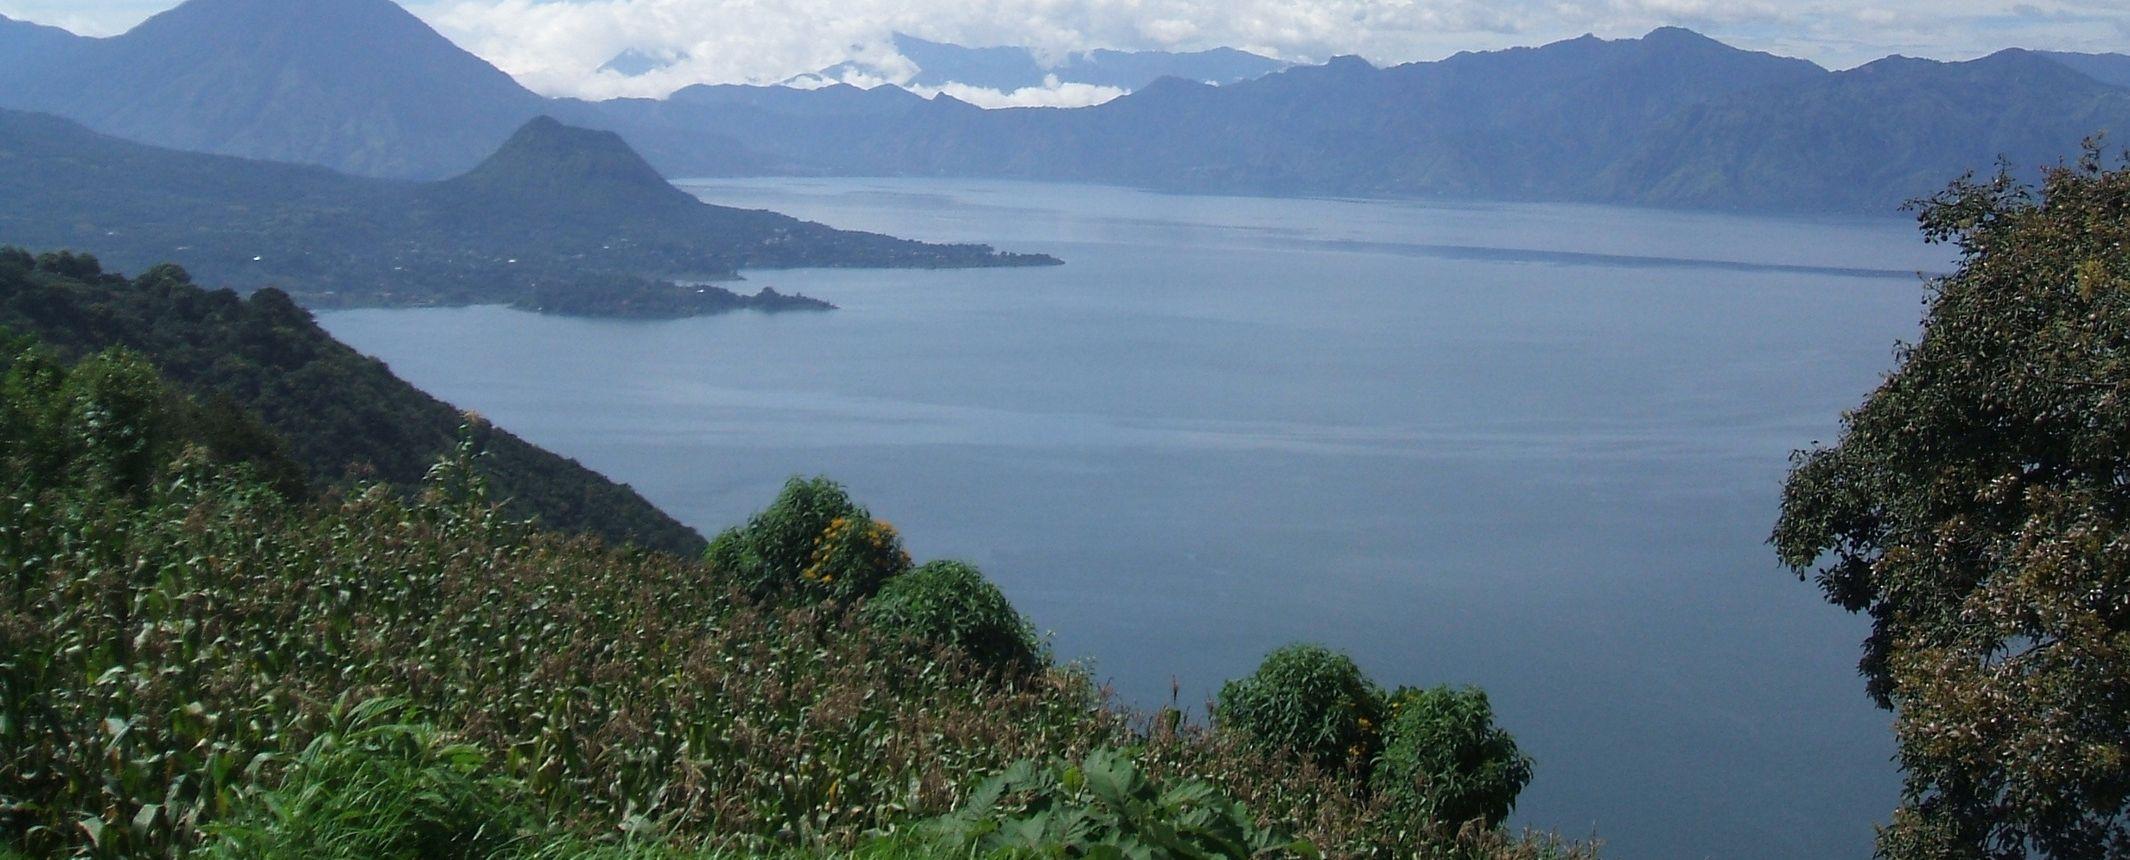 Guatemala  -  Selva Petén, Lago Atitlán, Sierra Cuchumatanes, Río Dulce, Caribe y Copán -